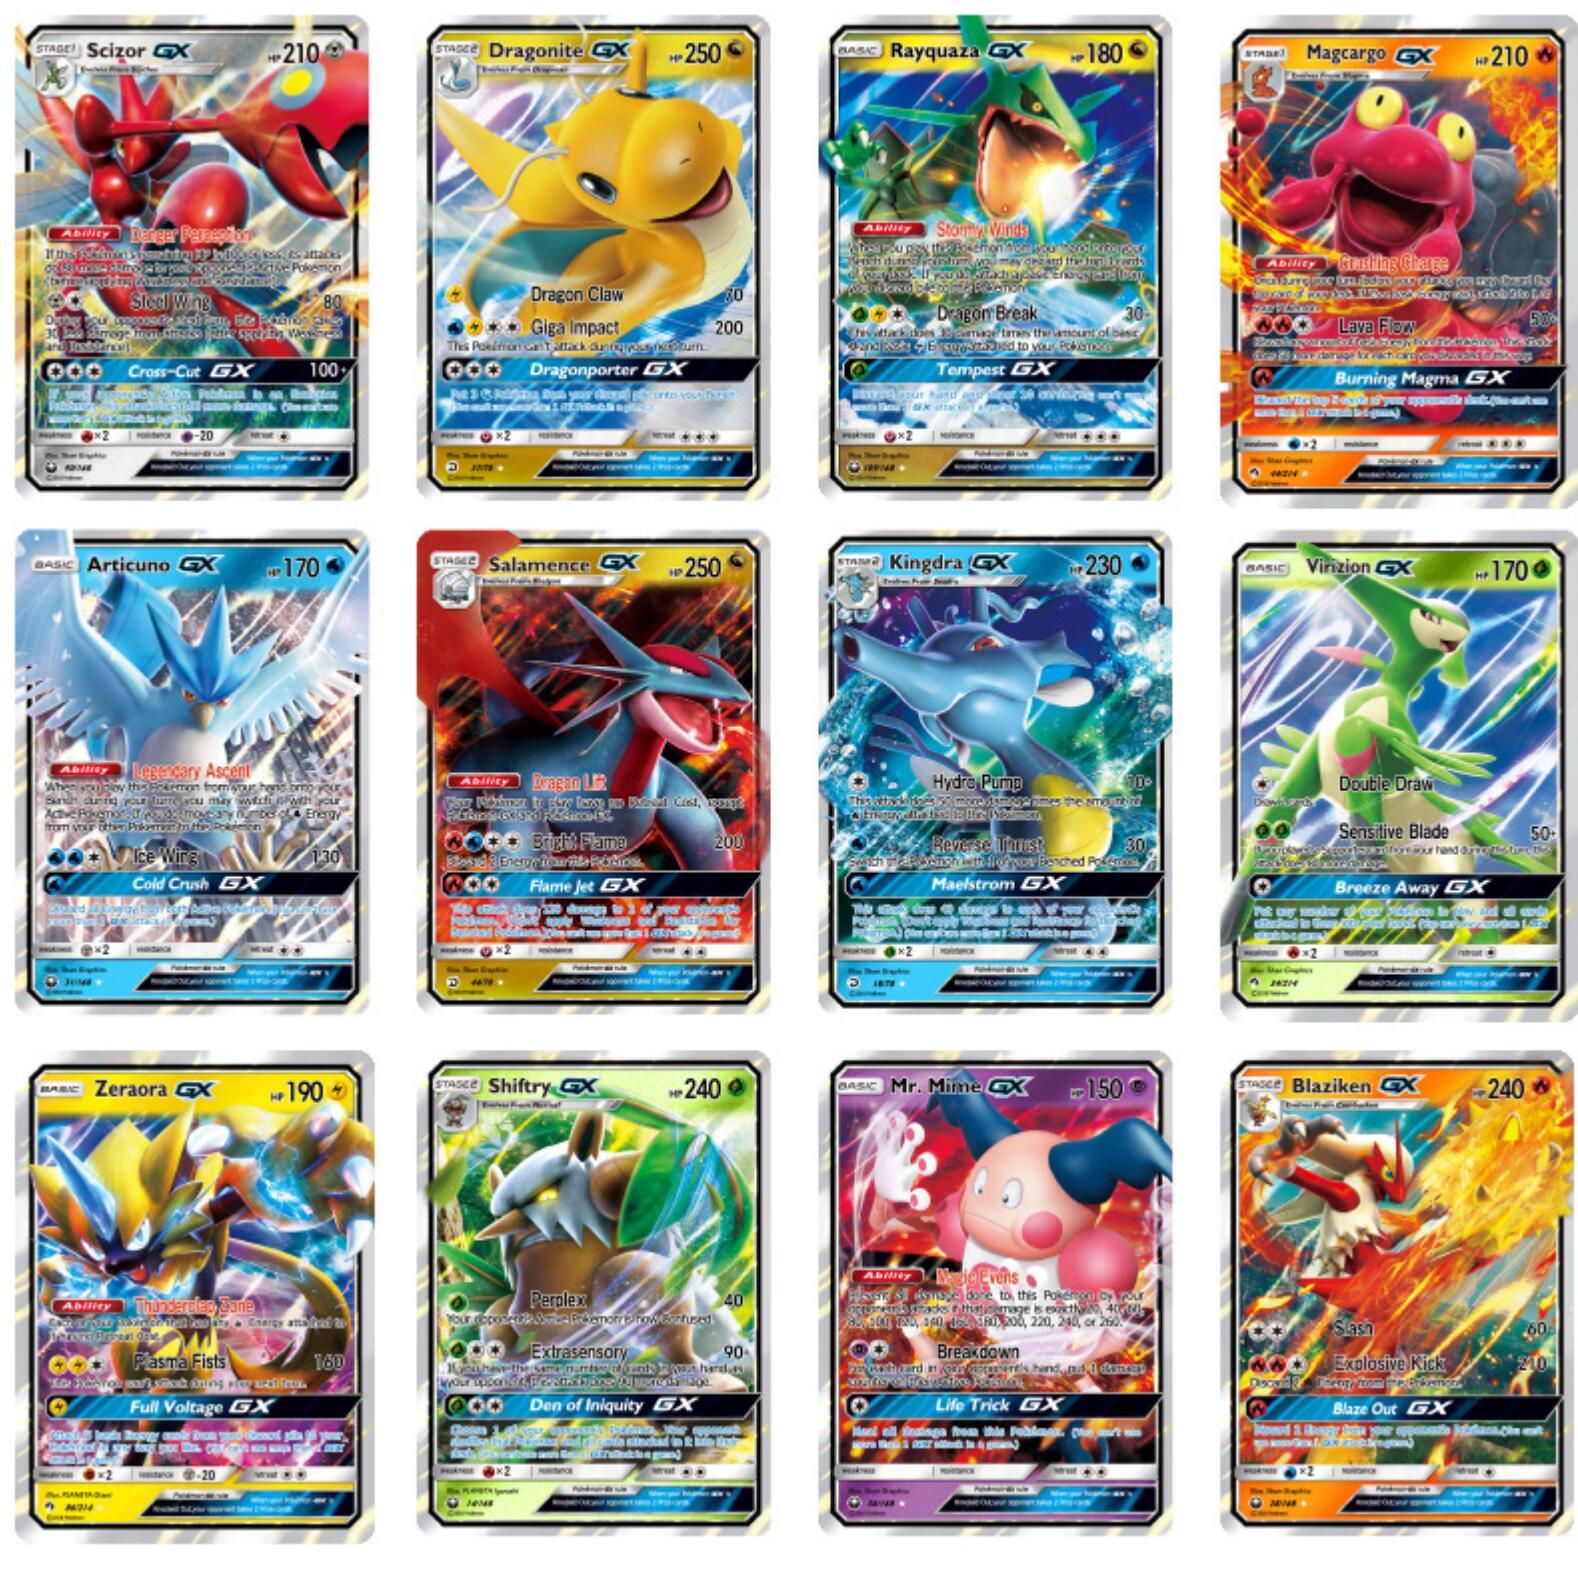 200-pcs-50-100-pcs-gx-font-b-pokemon-b-font-mega-shining-cards-takara-tomy-game-battle-carte-trading-cards-game-children-toy